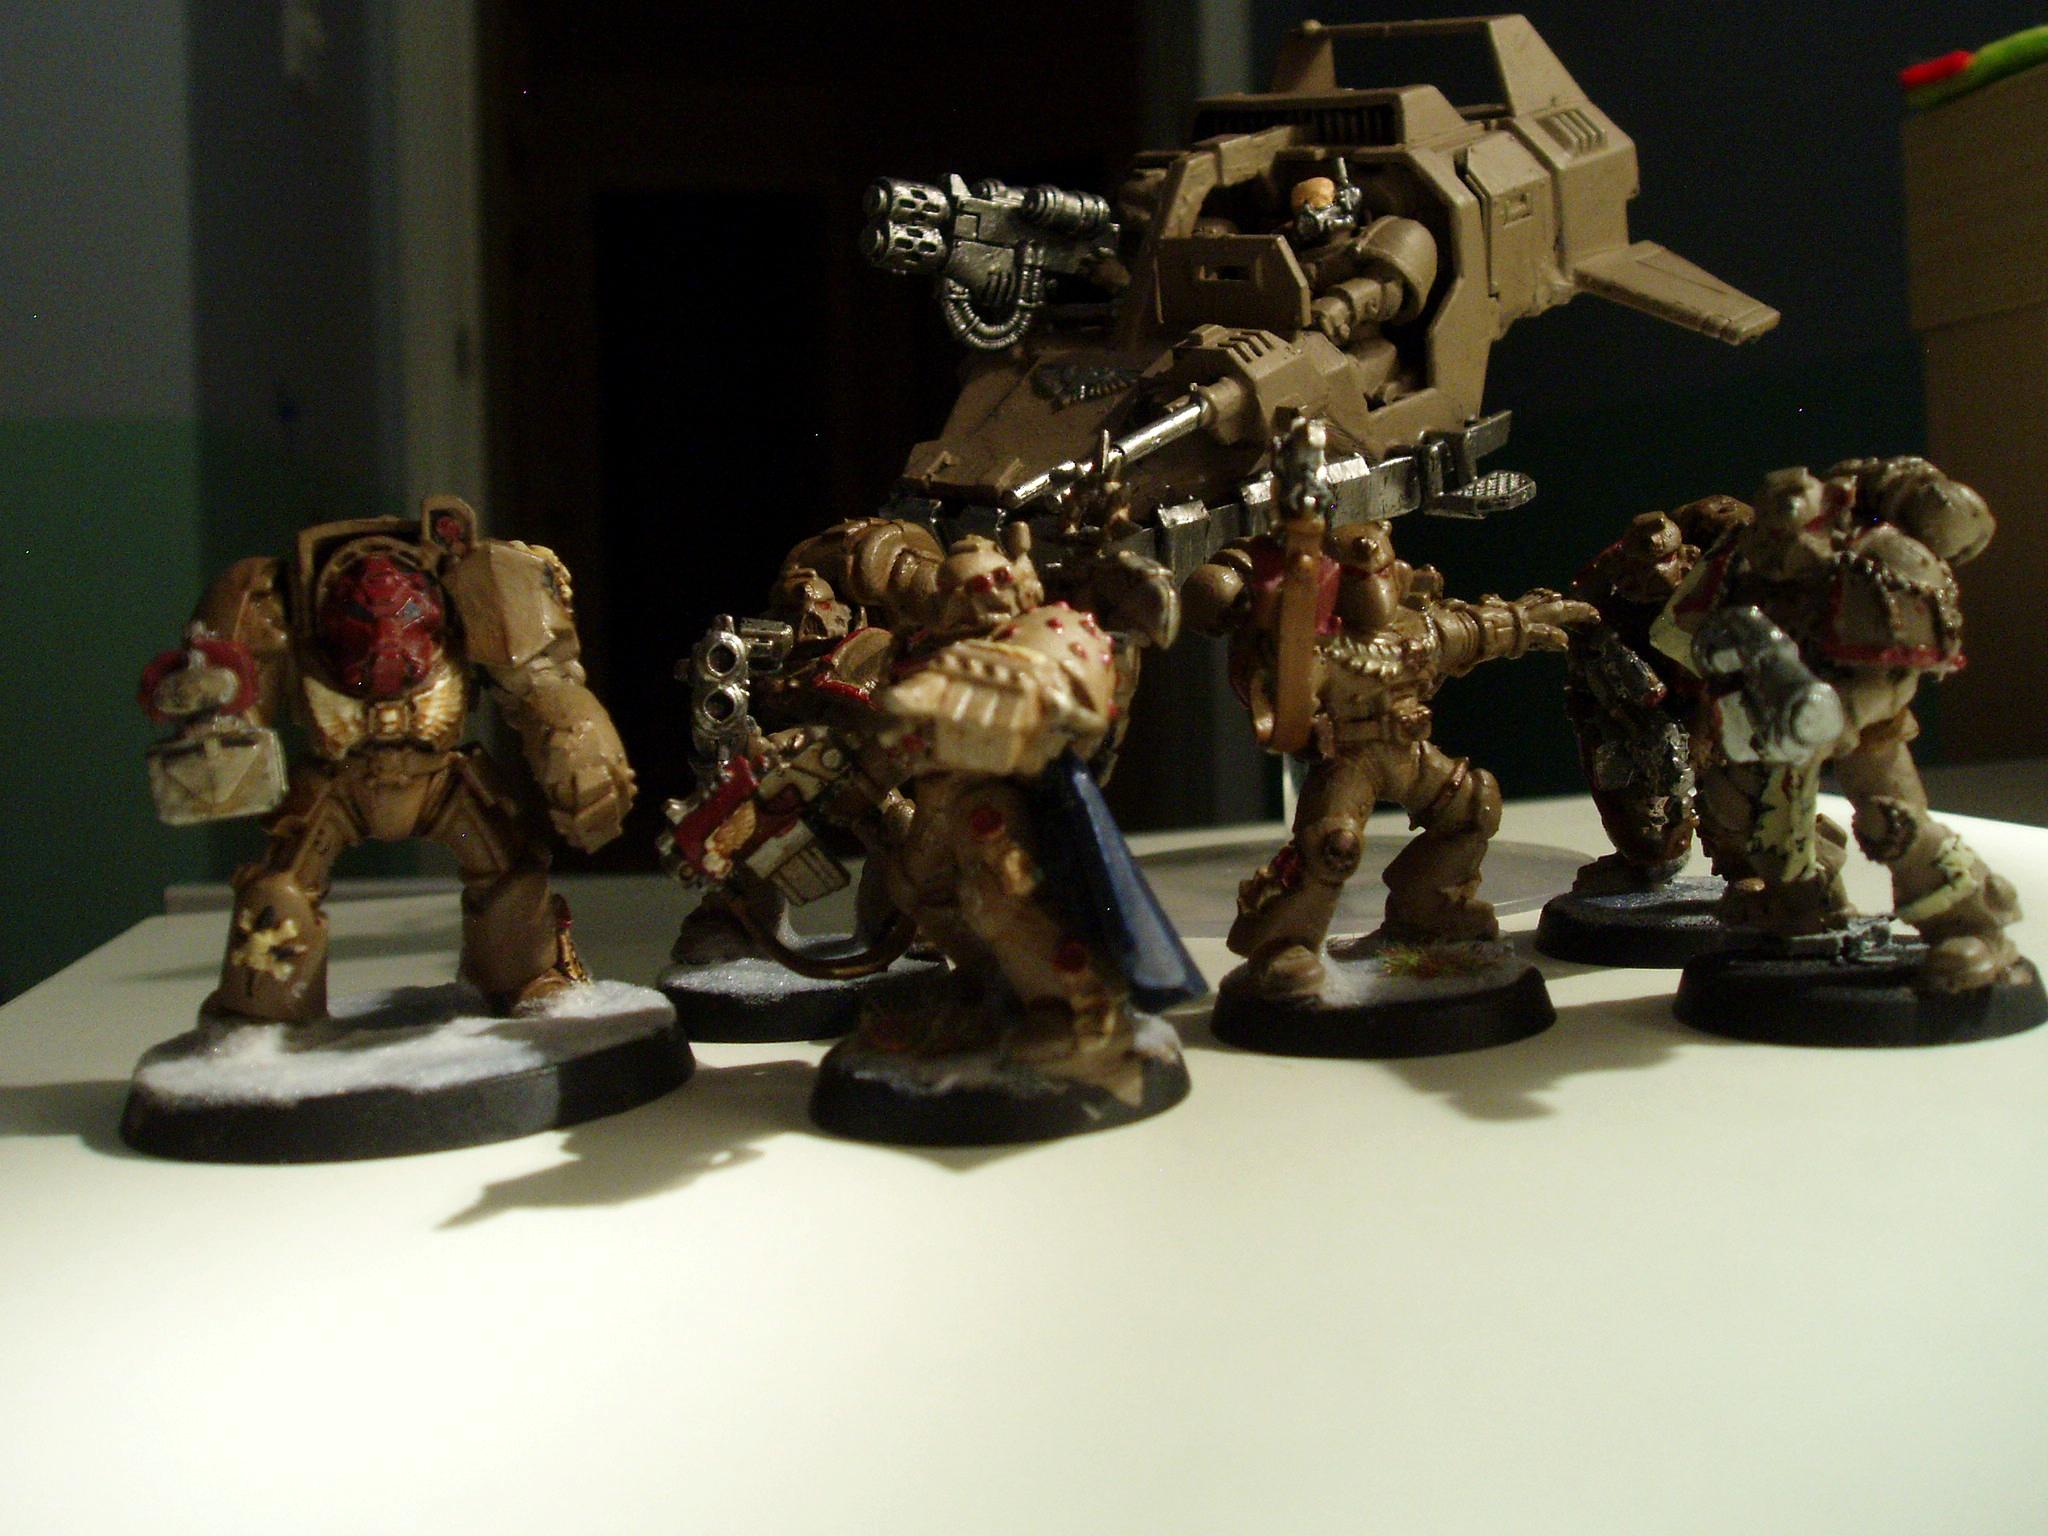 Blog, Gorgon, Sons, Updates